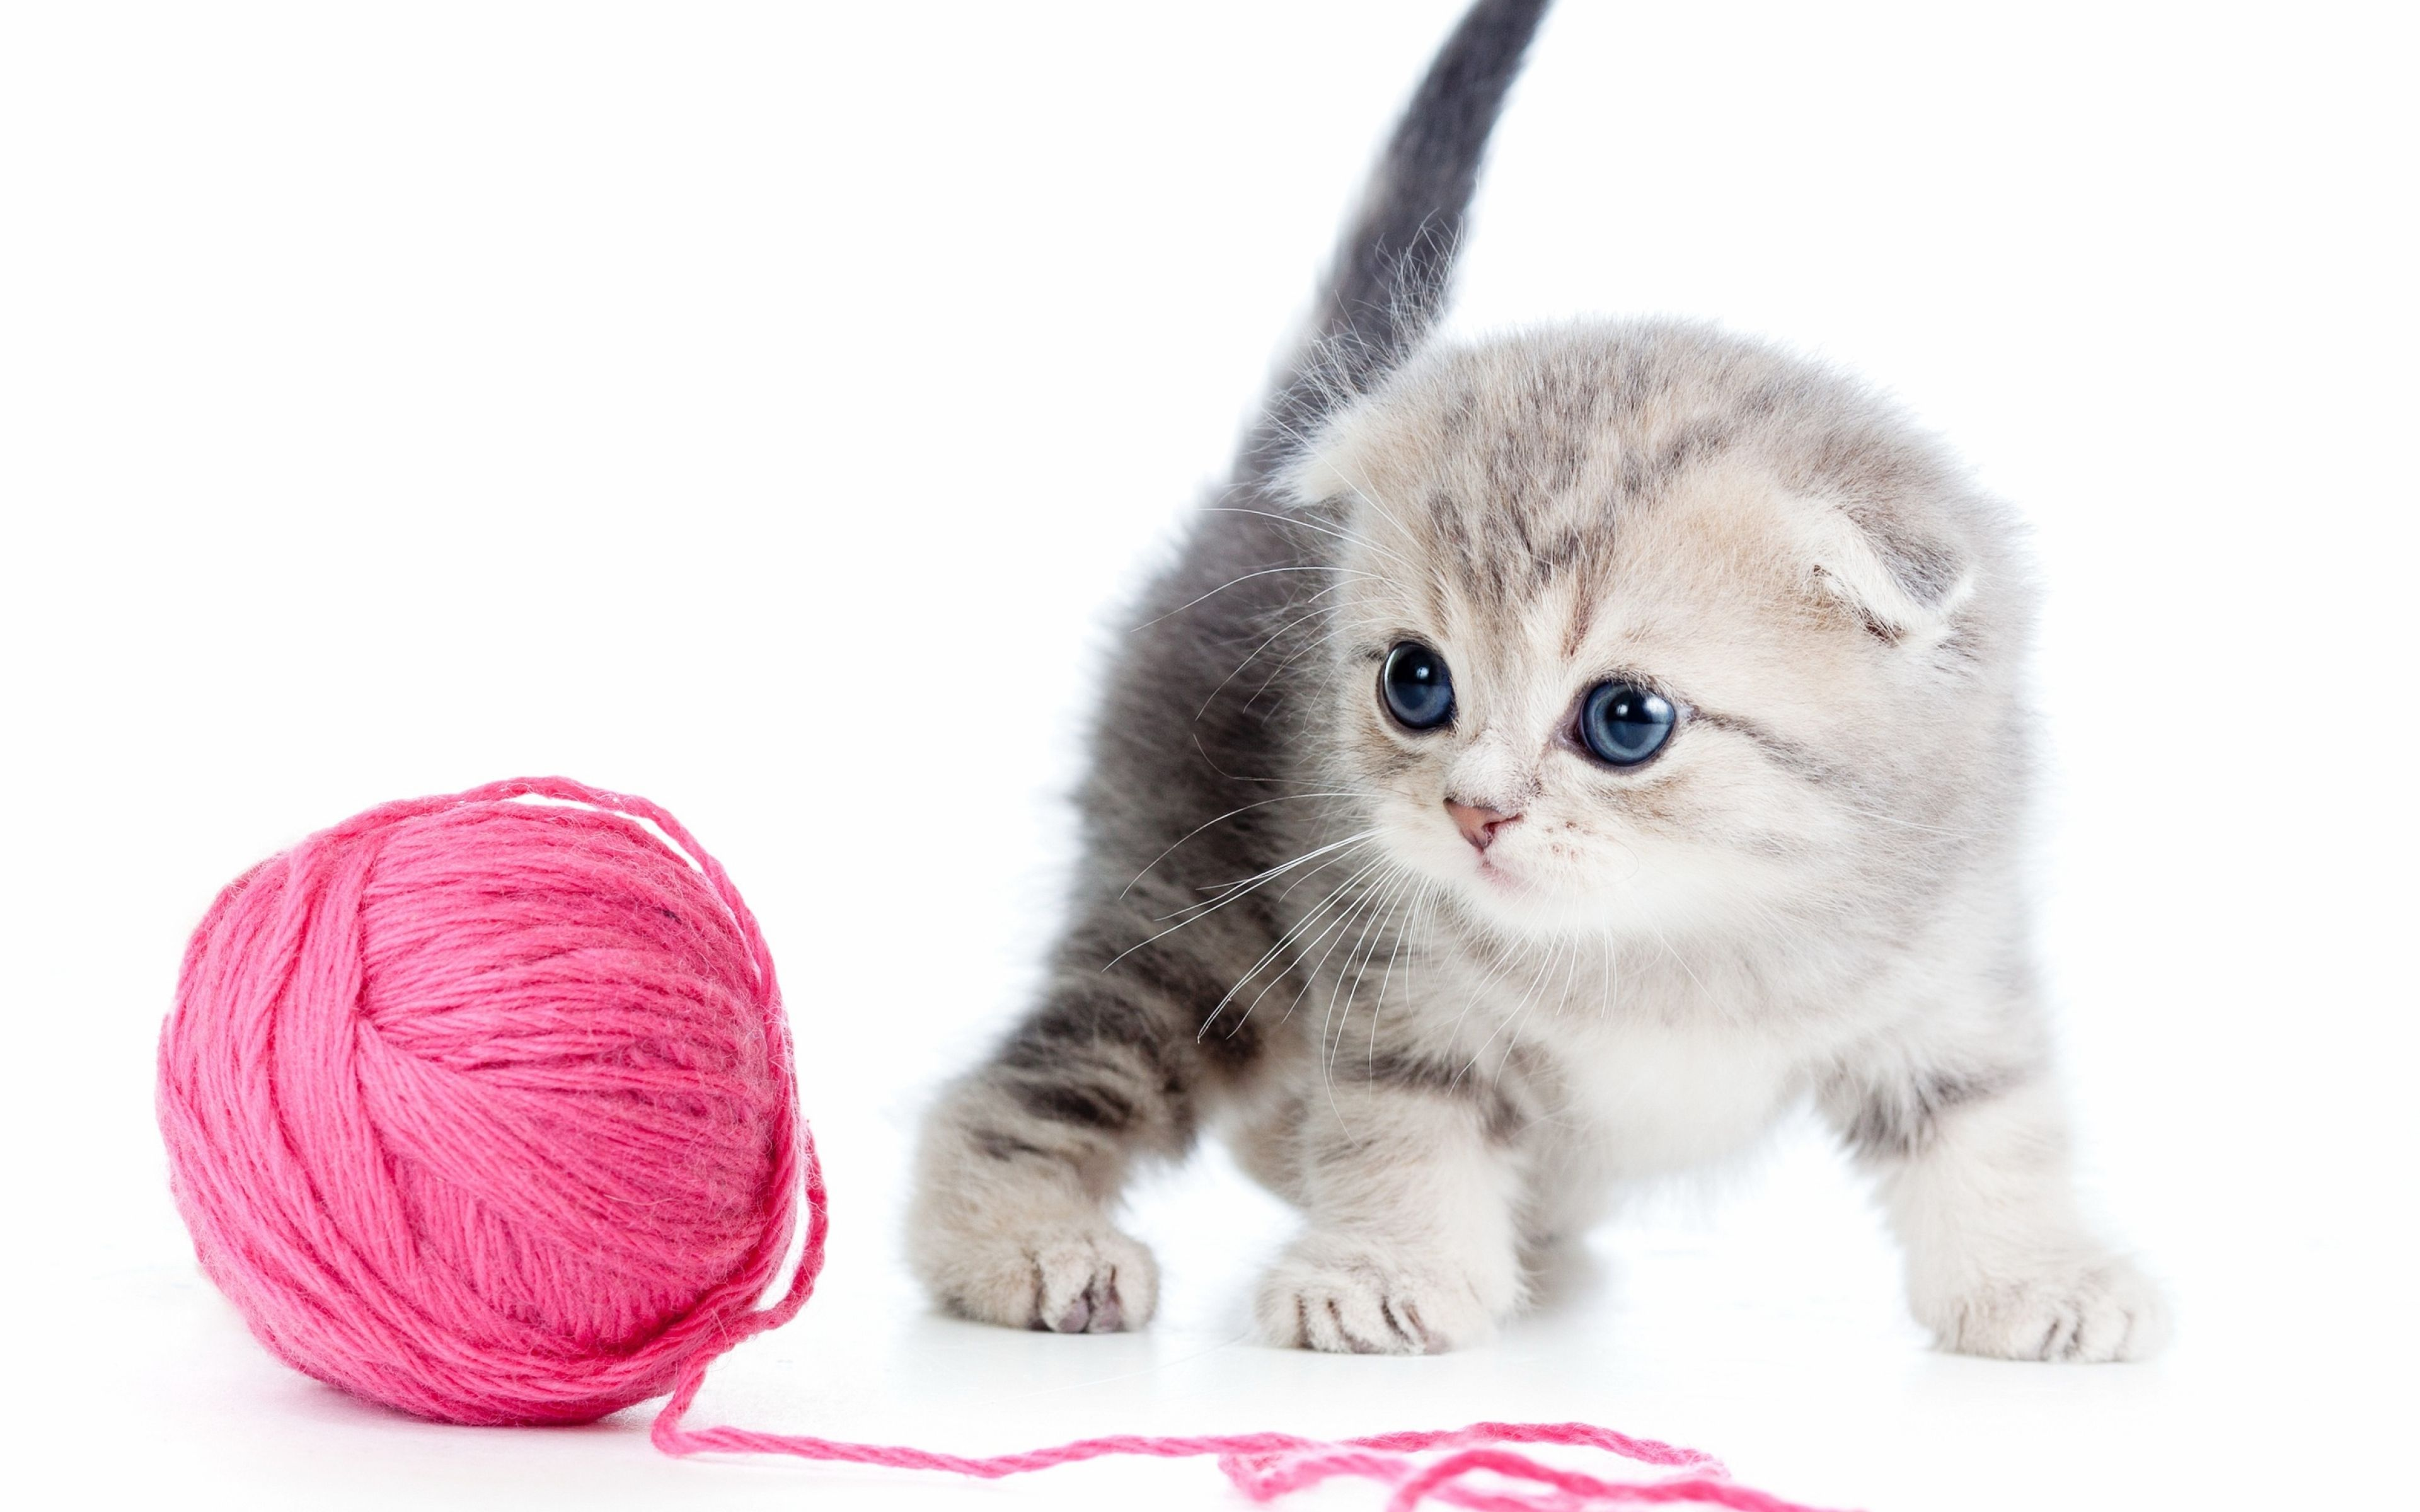 Cute White Kittens Wallpapers Kitten Wallpaper Cute Cats And Kittens Kittens Cutest